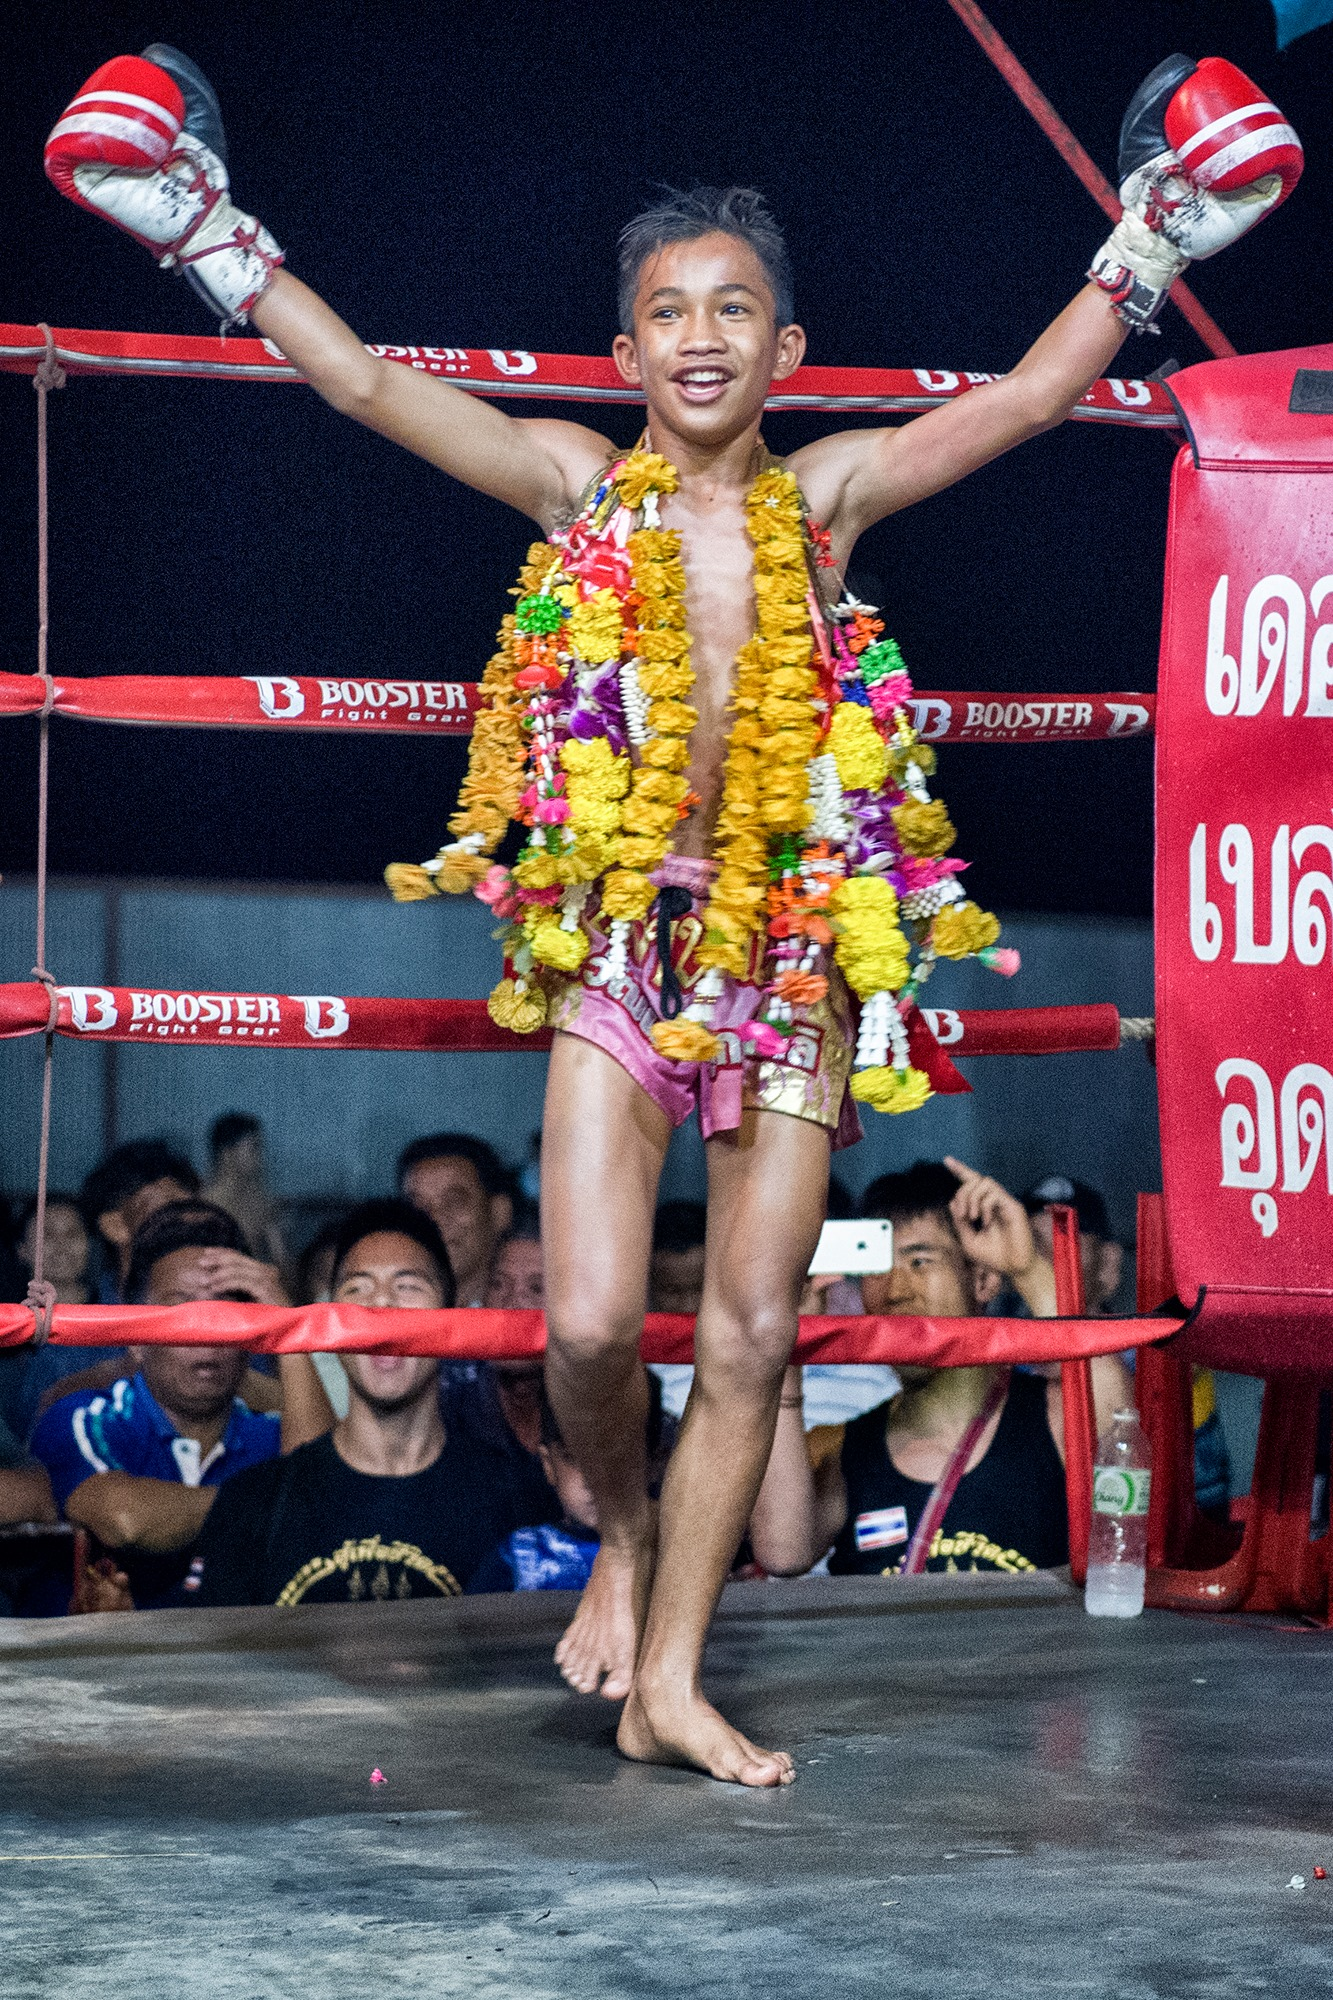 Lord K2 Child Champion